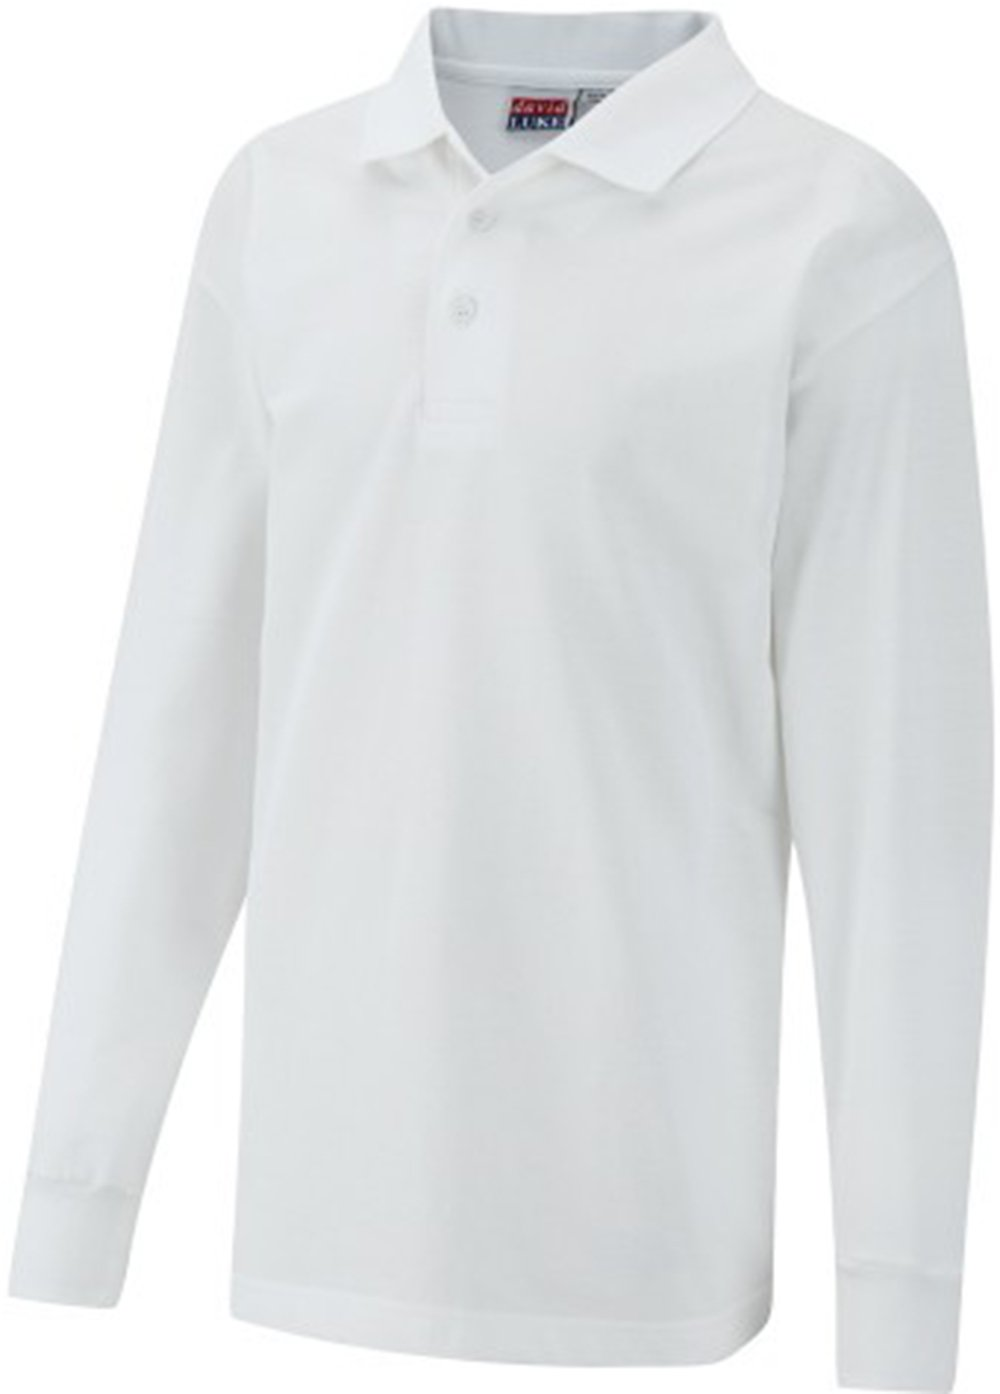 David Luke Childrens School Uniform Shirt Kids Schoolwear Long Sleeve Pique Poloshirt